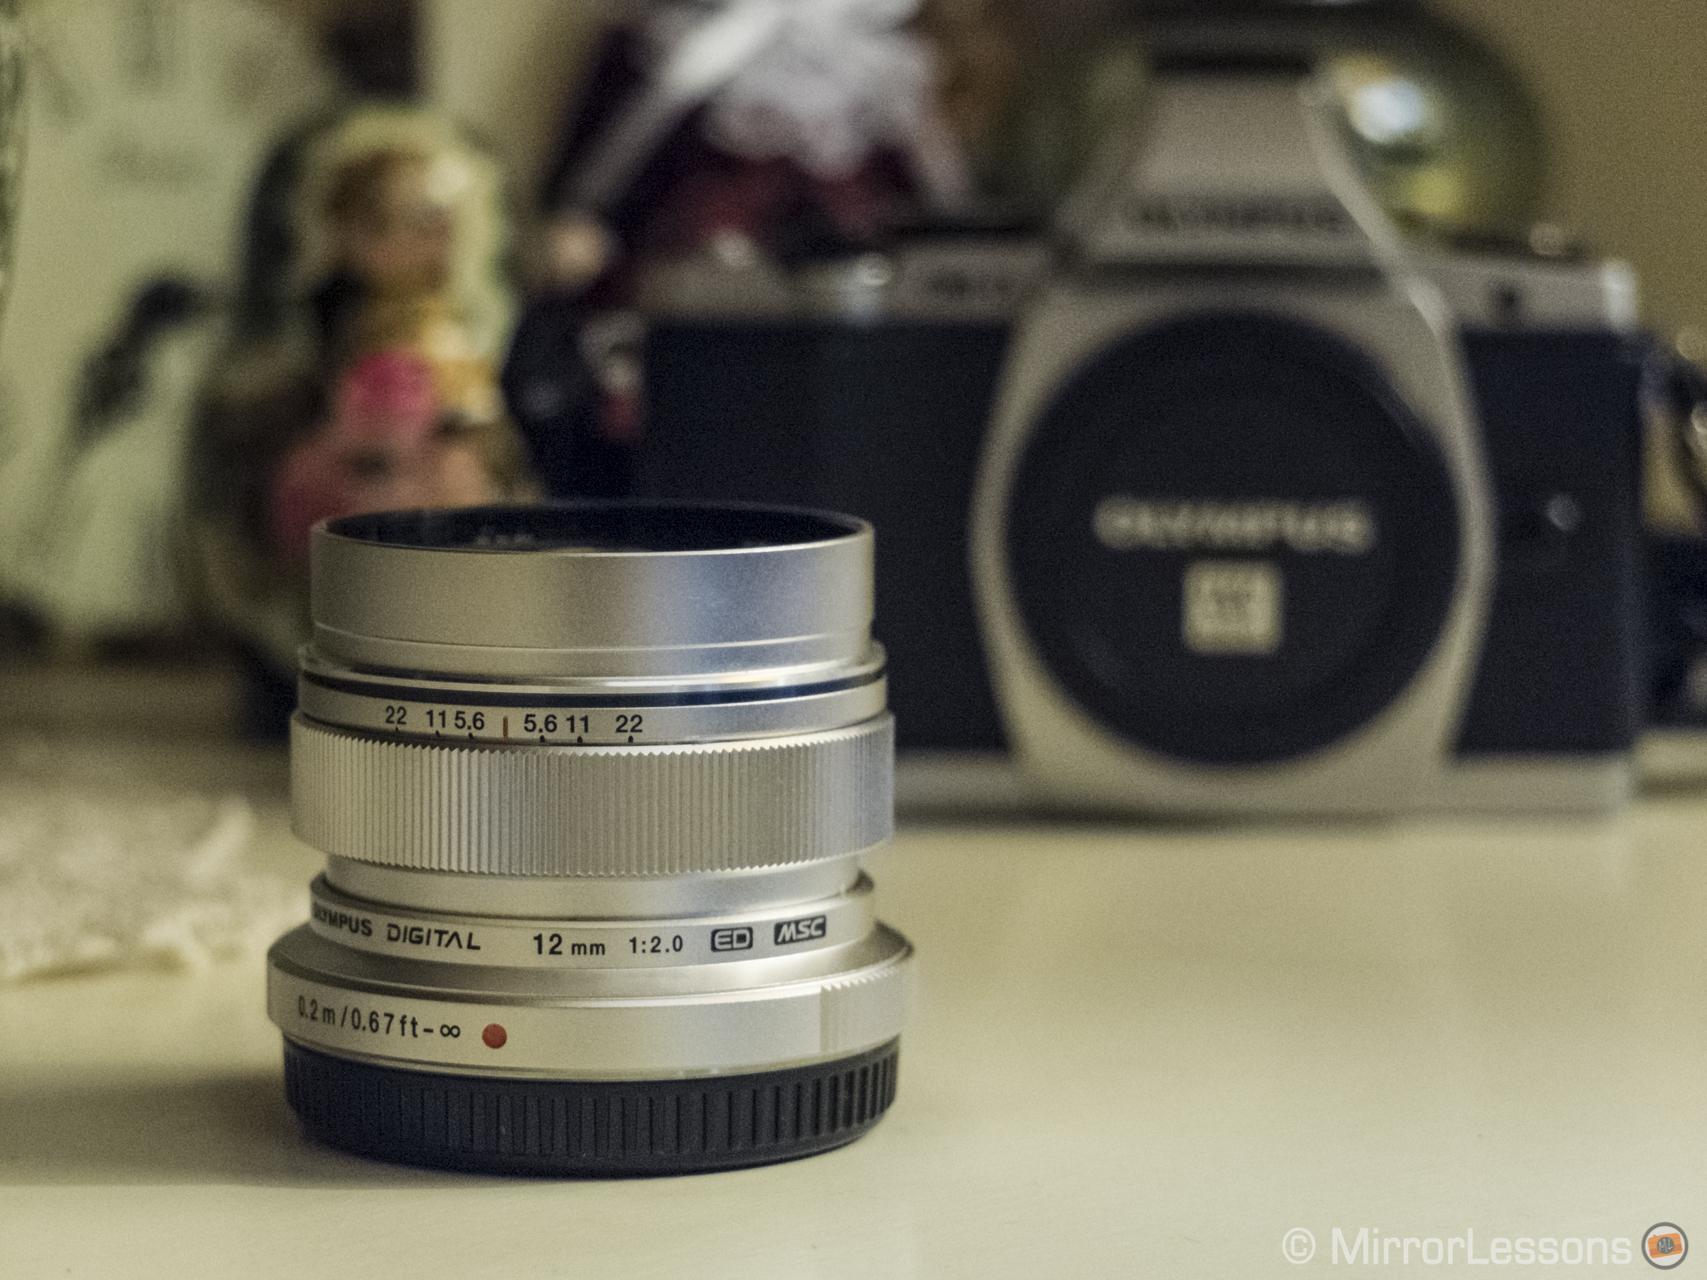 The Olympus M.Zuiko 12mm f/2 lens